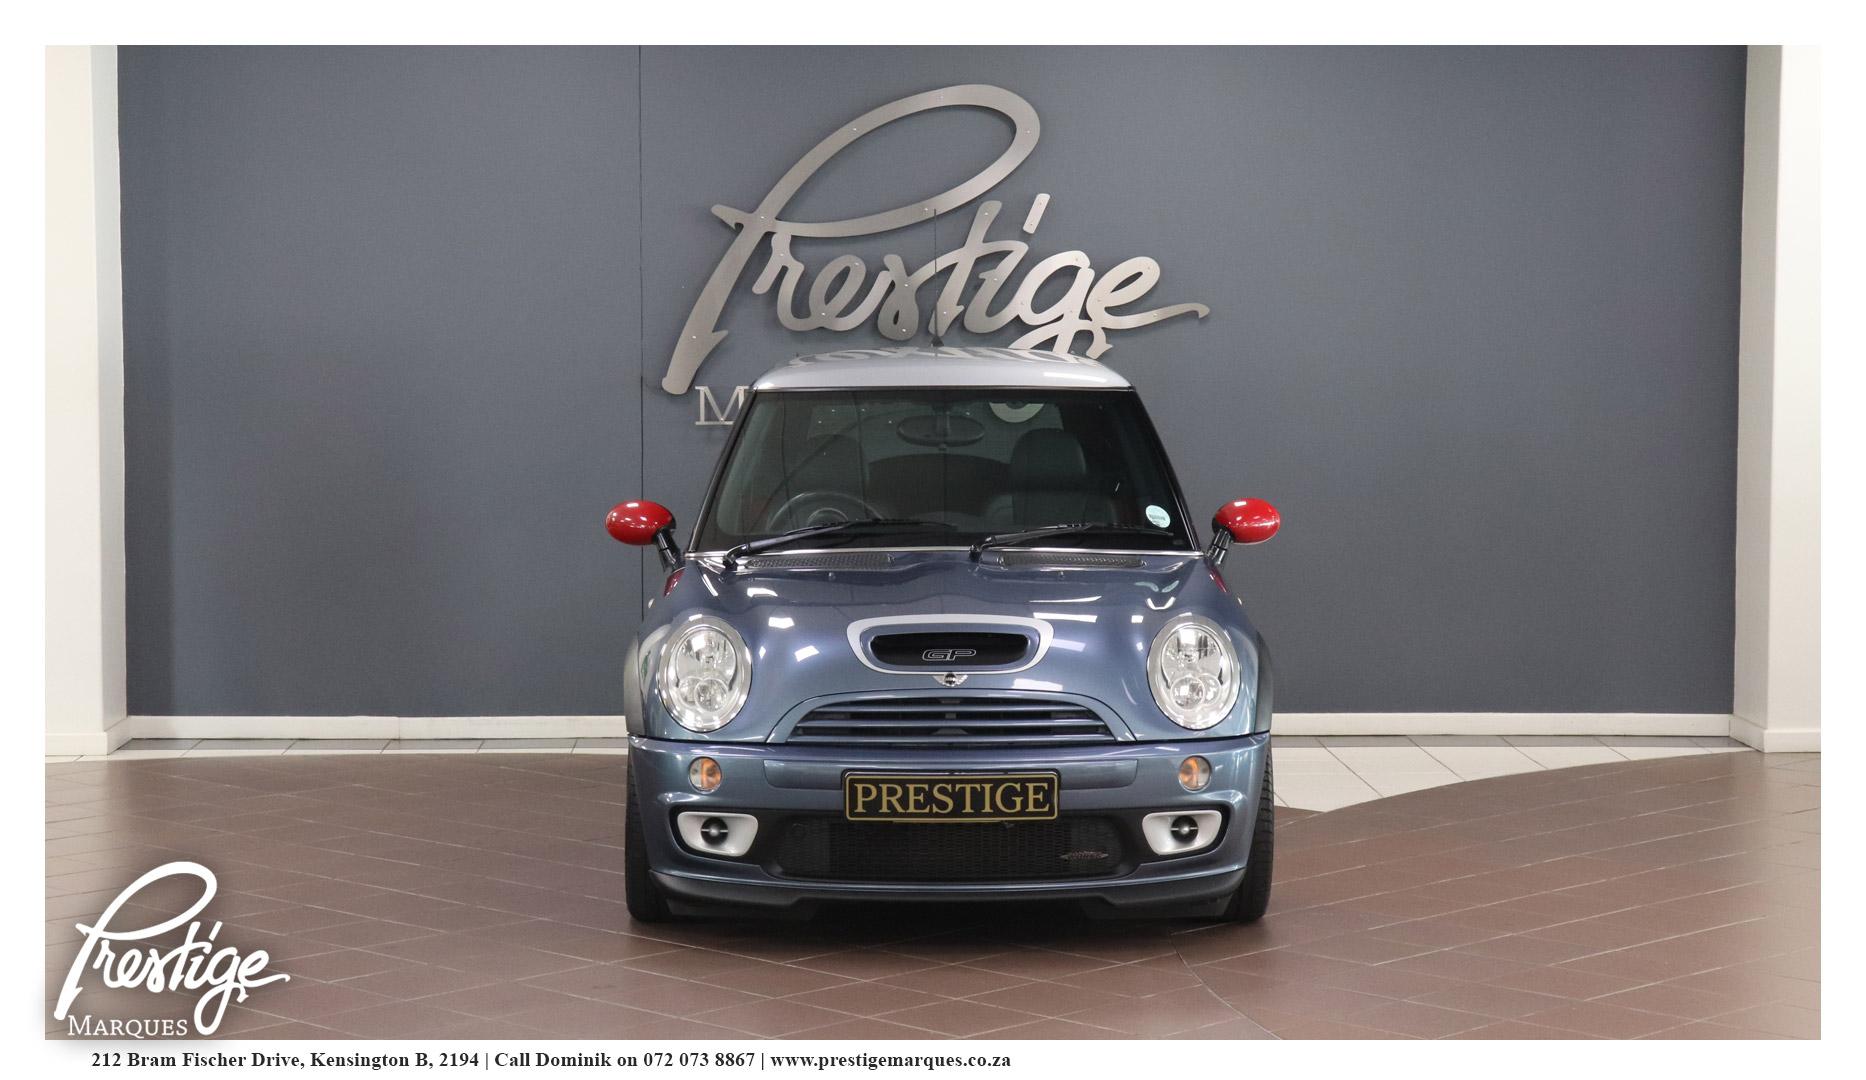 2006-Mini-Cooper-S-GP-Johon-Cooper-Works- Prestige-Marques-Randburg-Sandton-10